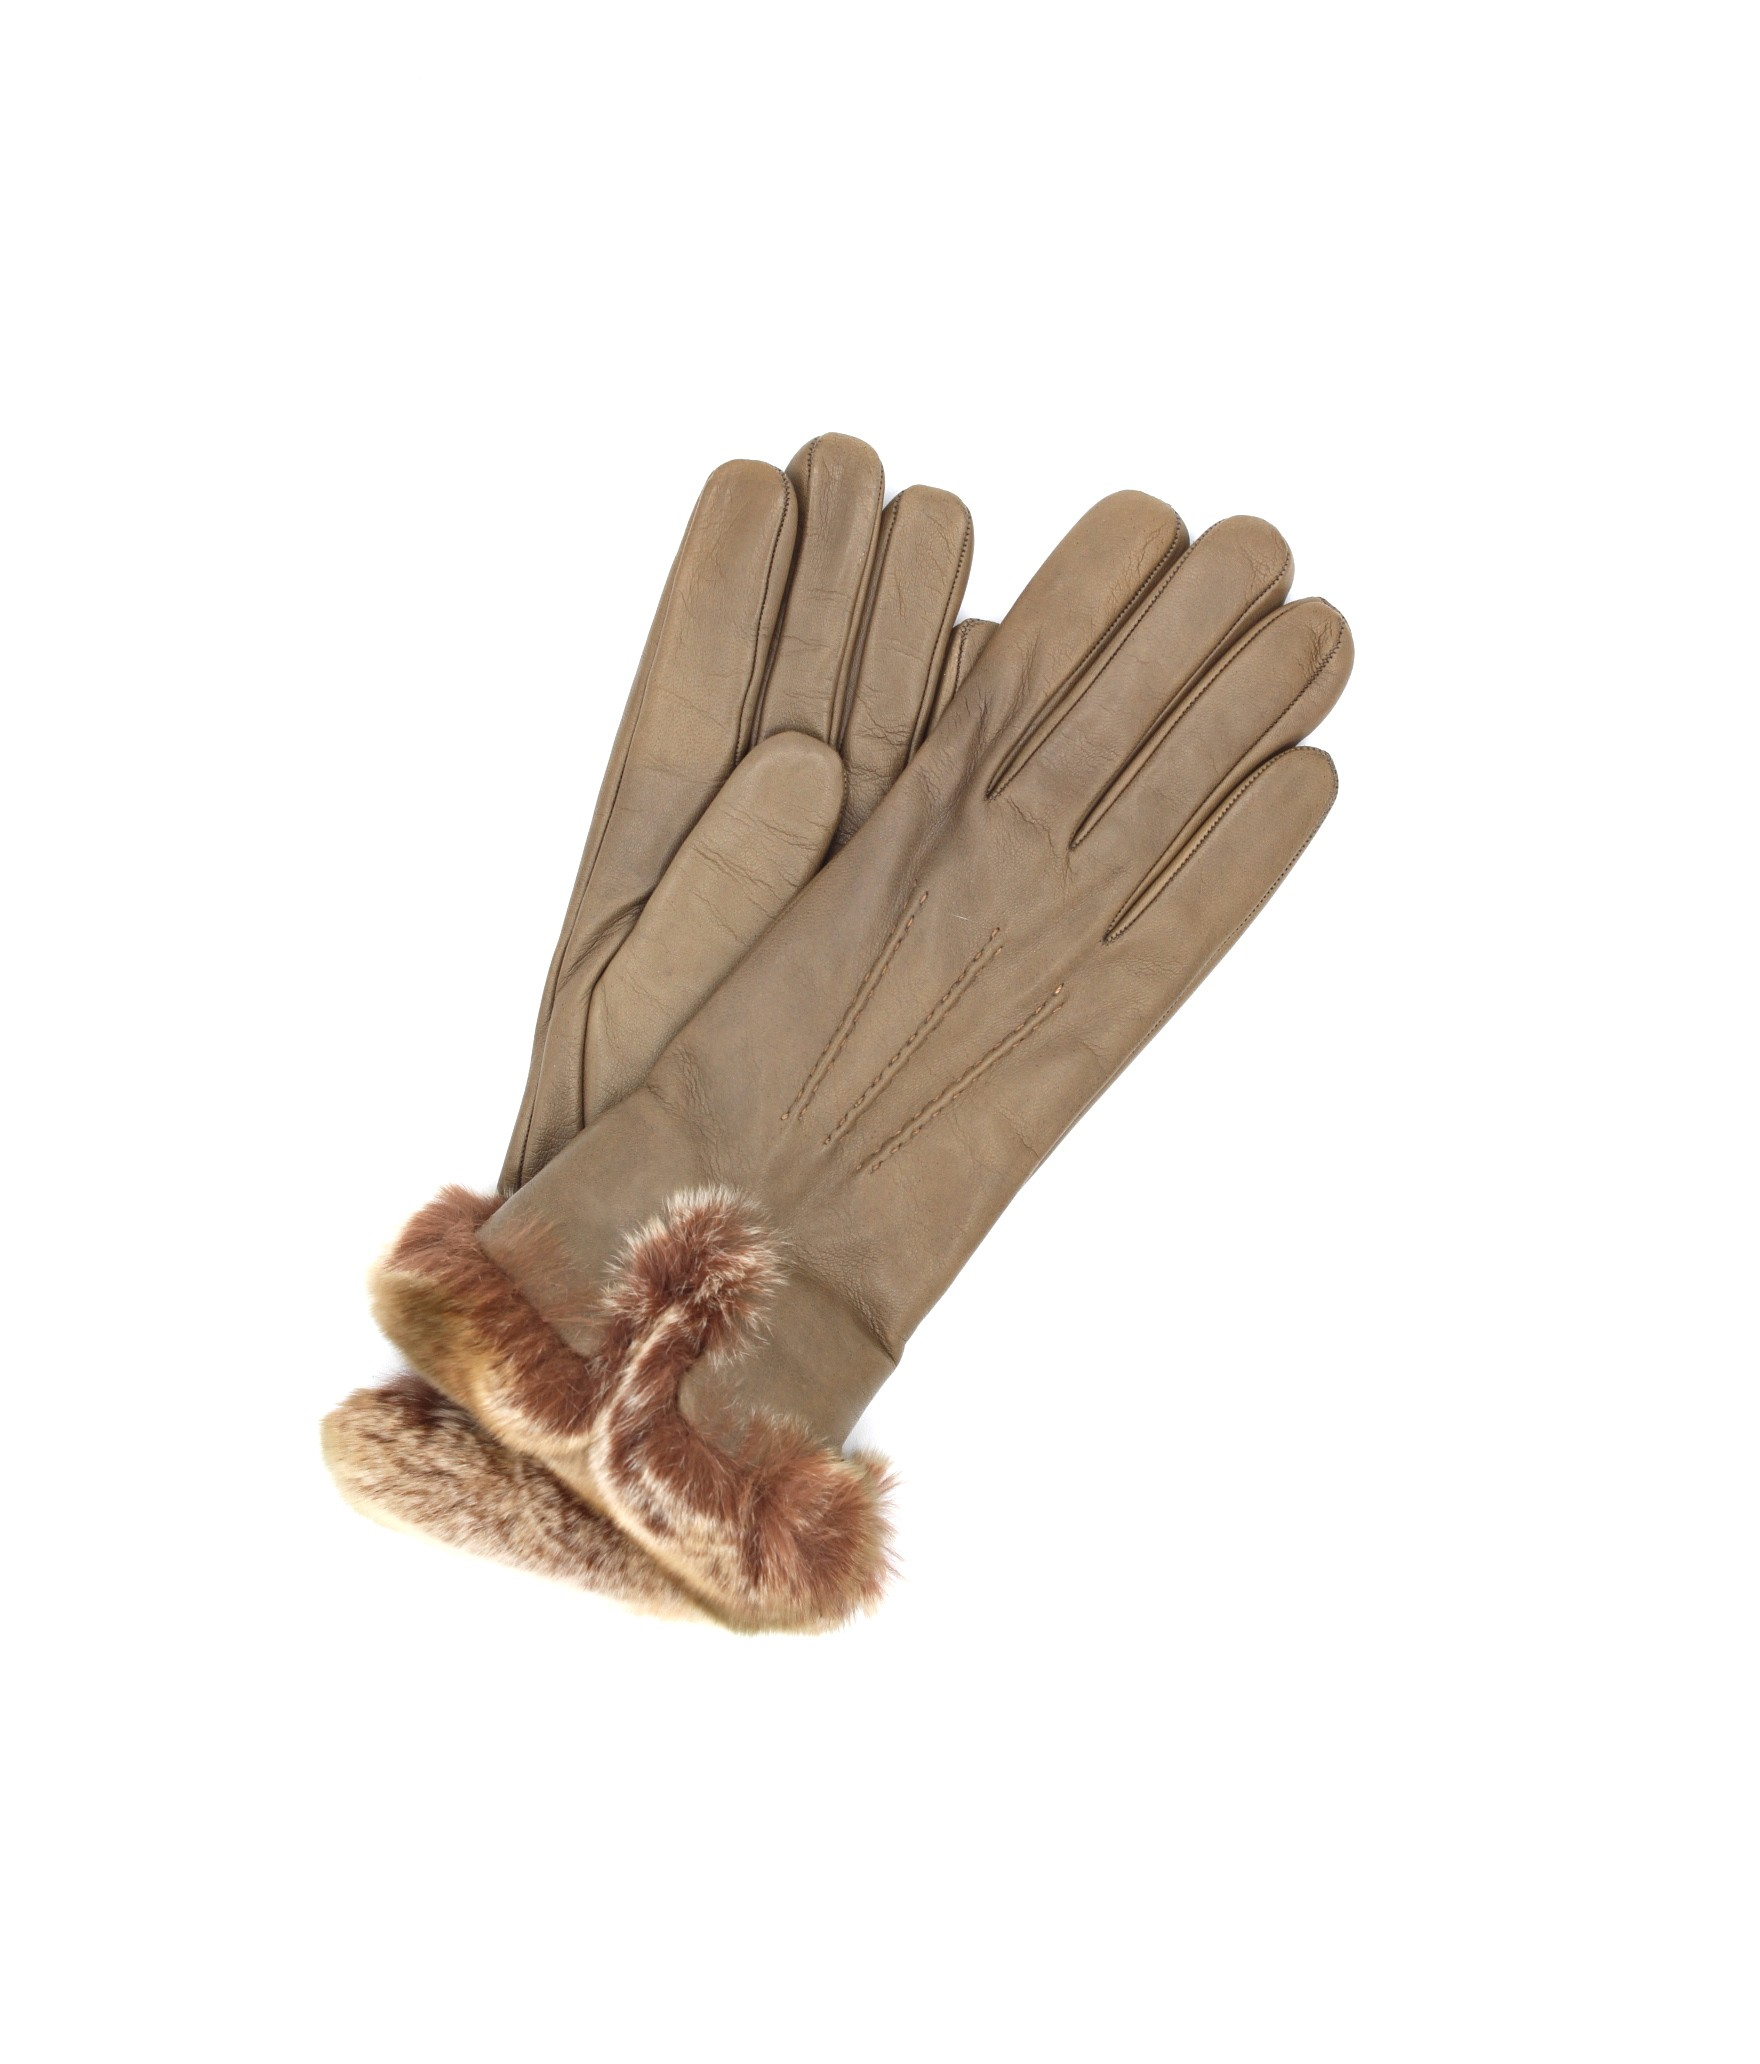 Guanto Nappa fodera cashmere bordo Rex Fango Sermoneta Gloves